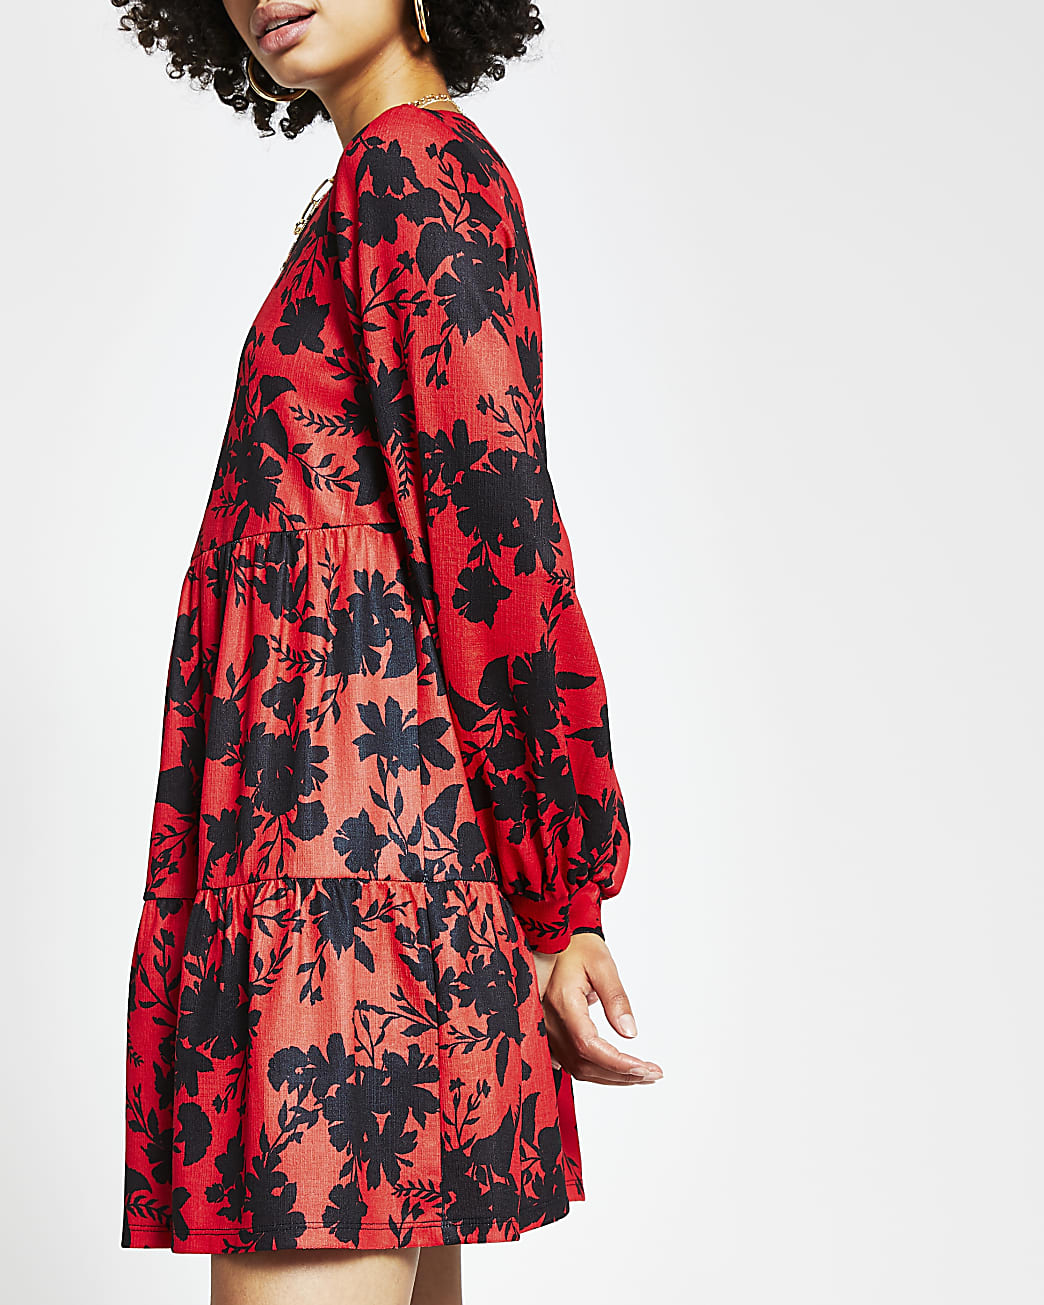 Red long sleeve floral smock dress